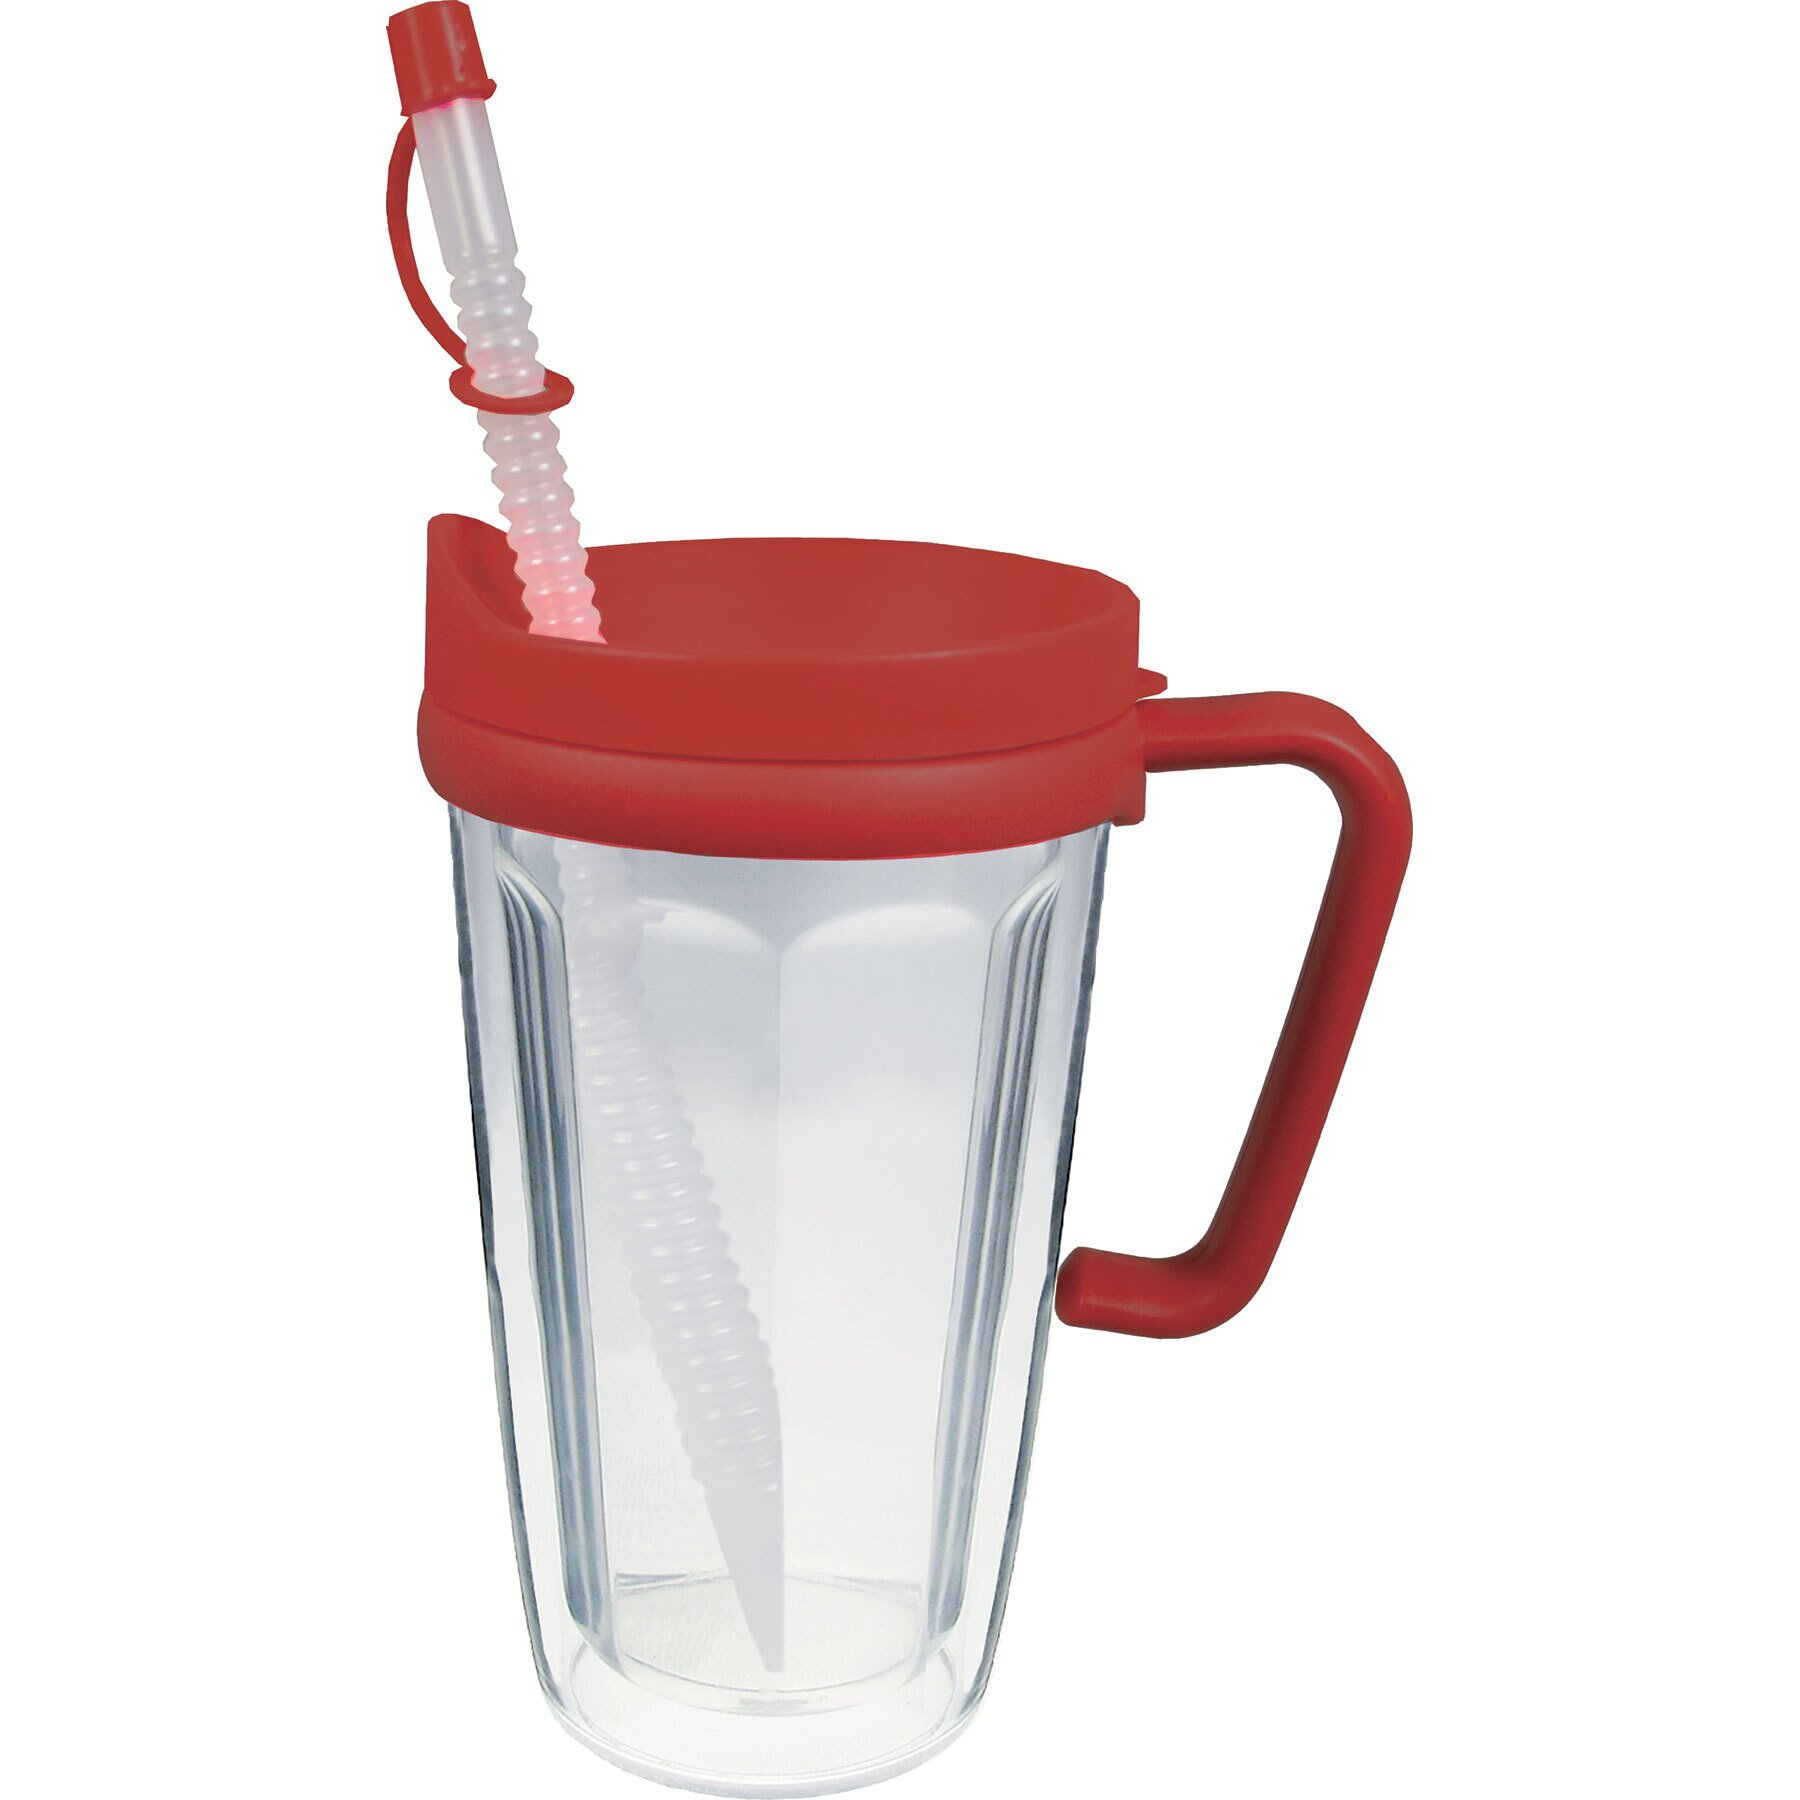 Thermal Travel Mug with Handle, 16oz. w/ Full Color Imprint